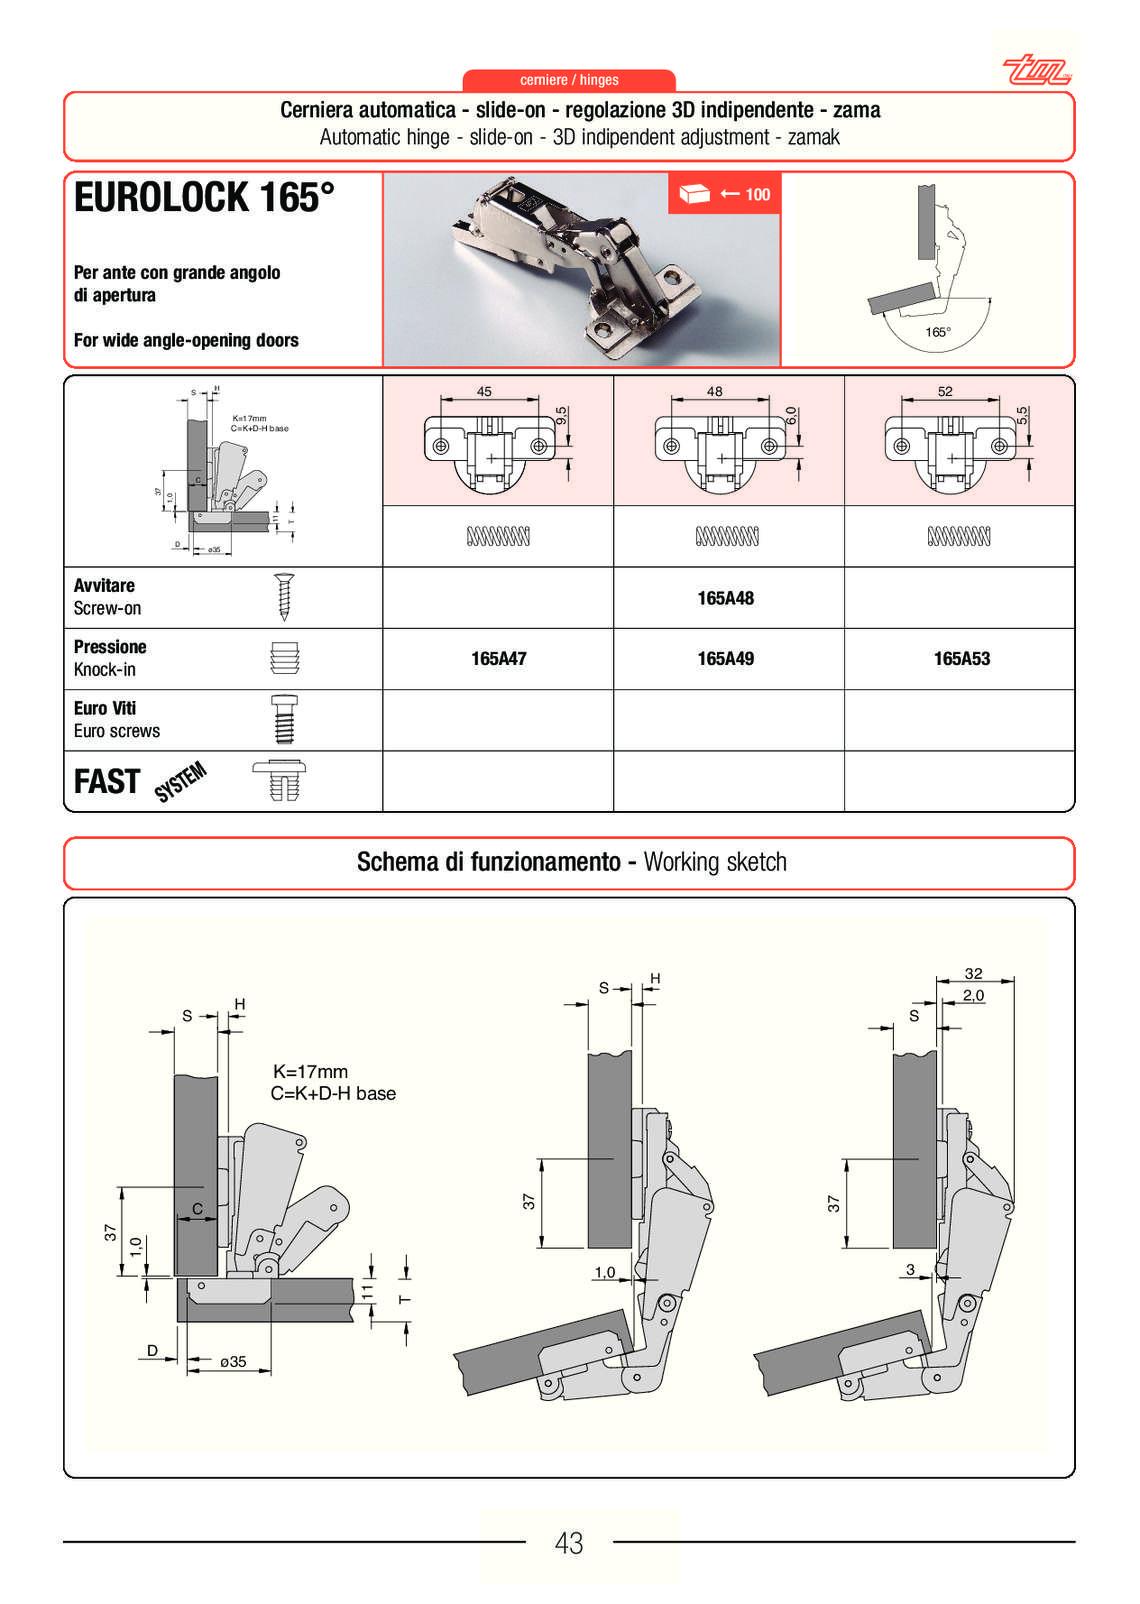 euro-hinges-catalogue_175_042.jpg